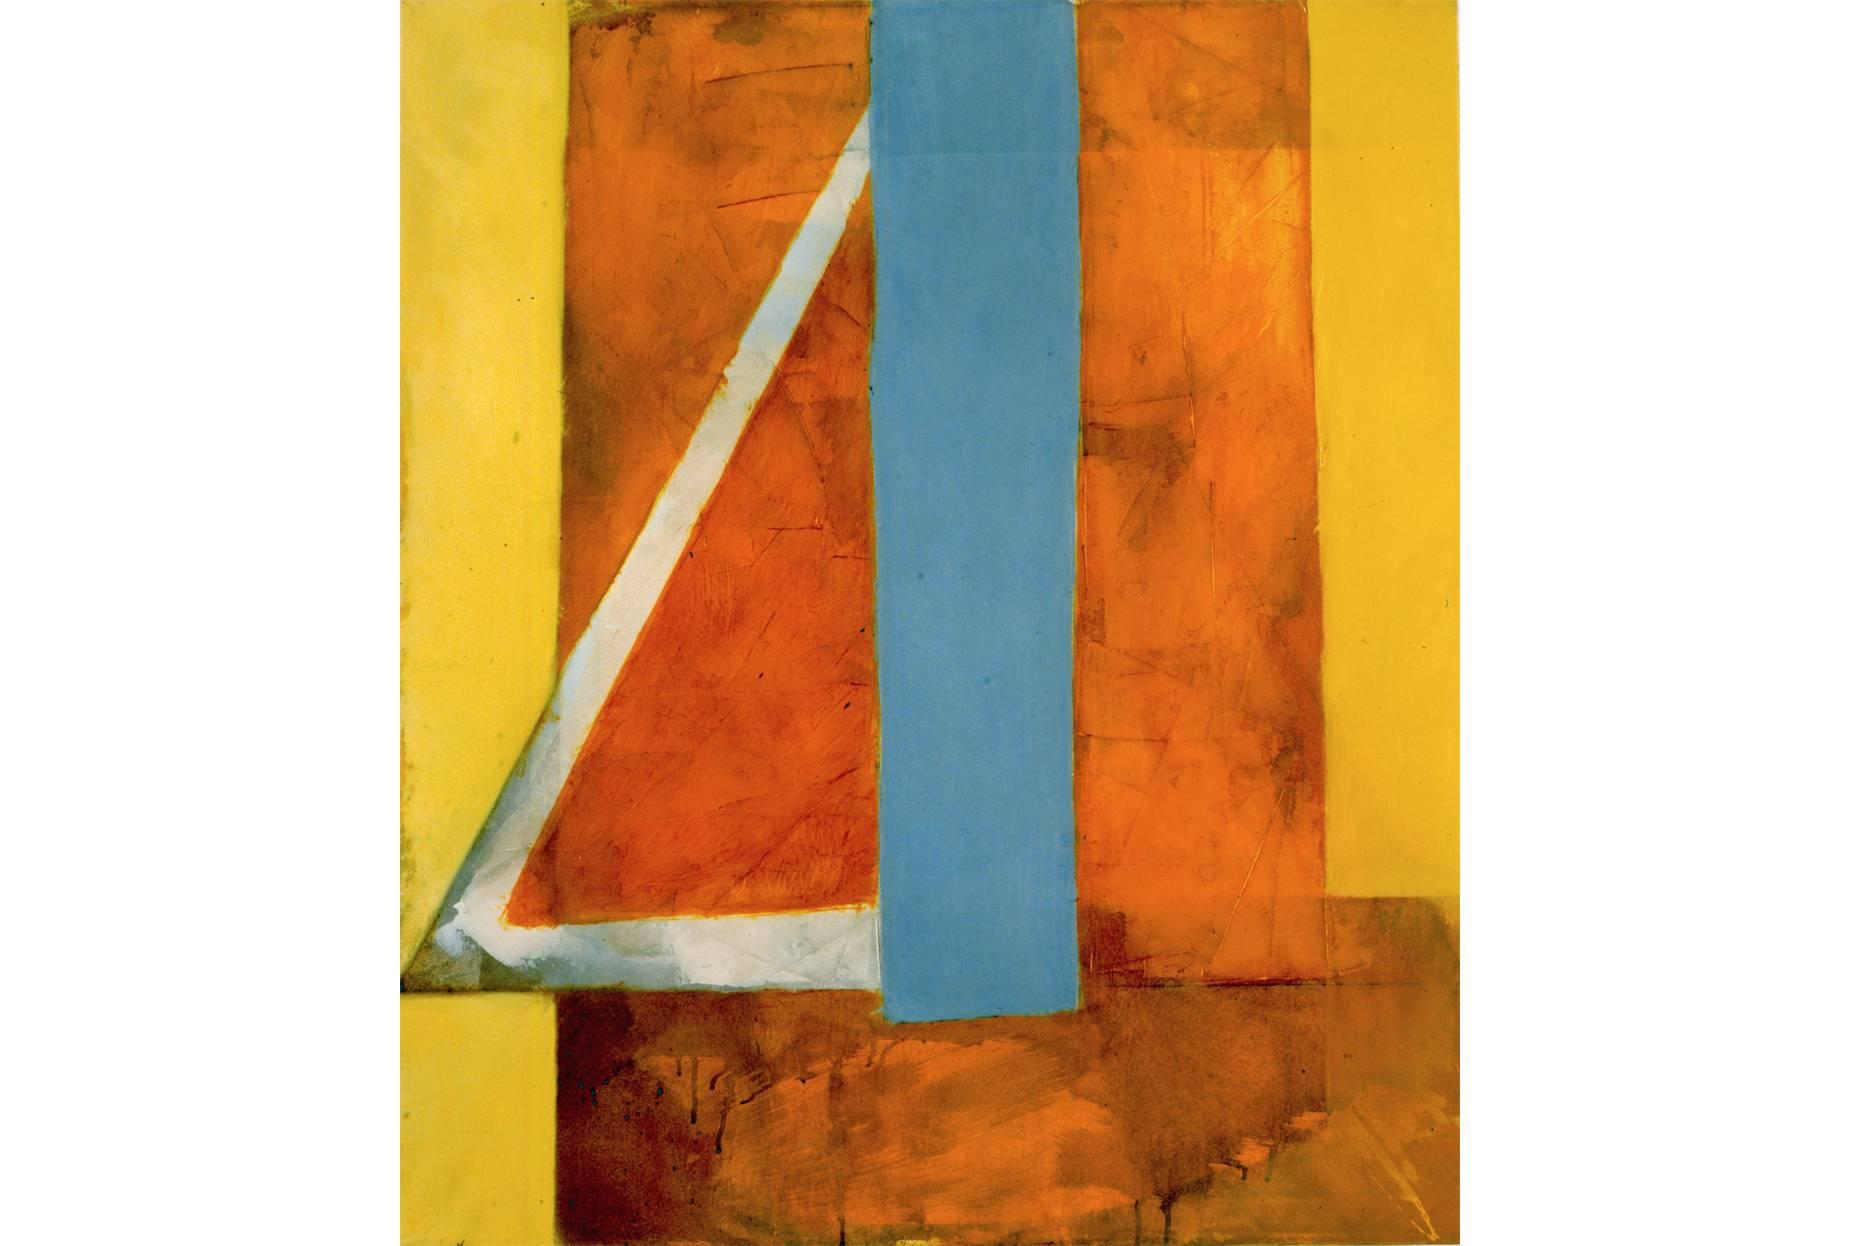 o.T. 1991 Pigment Acrylspachtel und Ölfarbe a/Nessel 105 x 90 cm